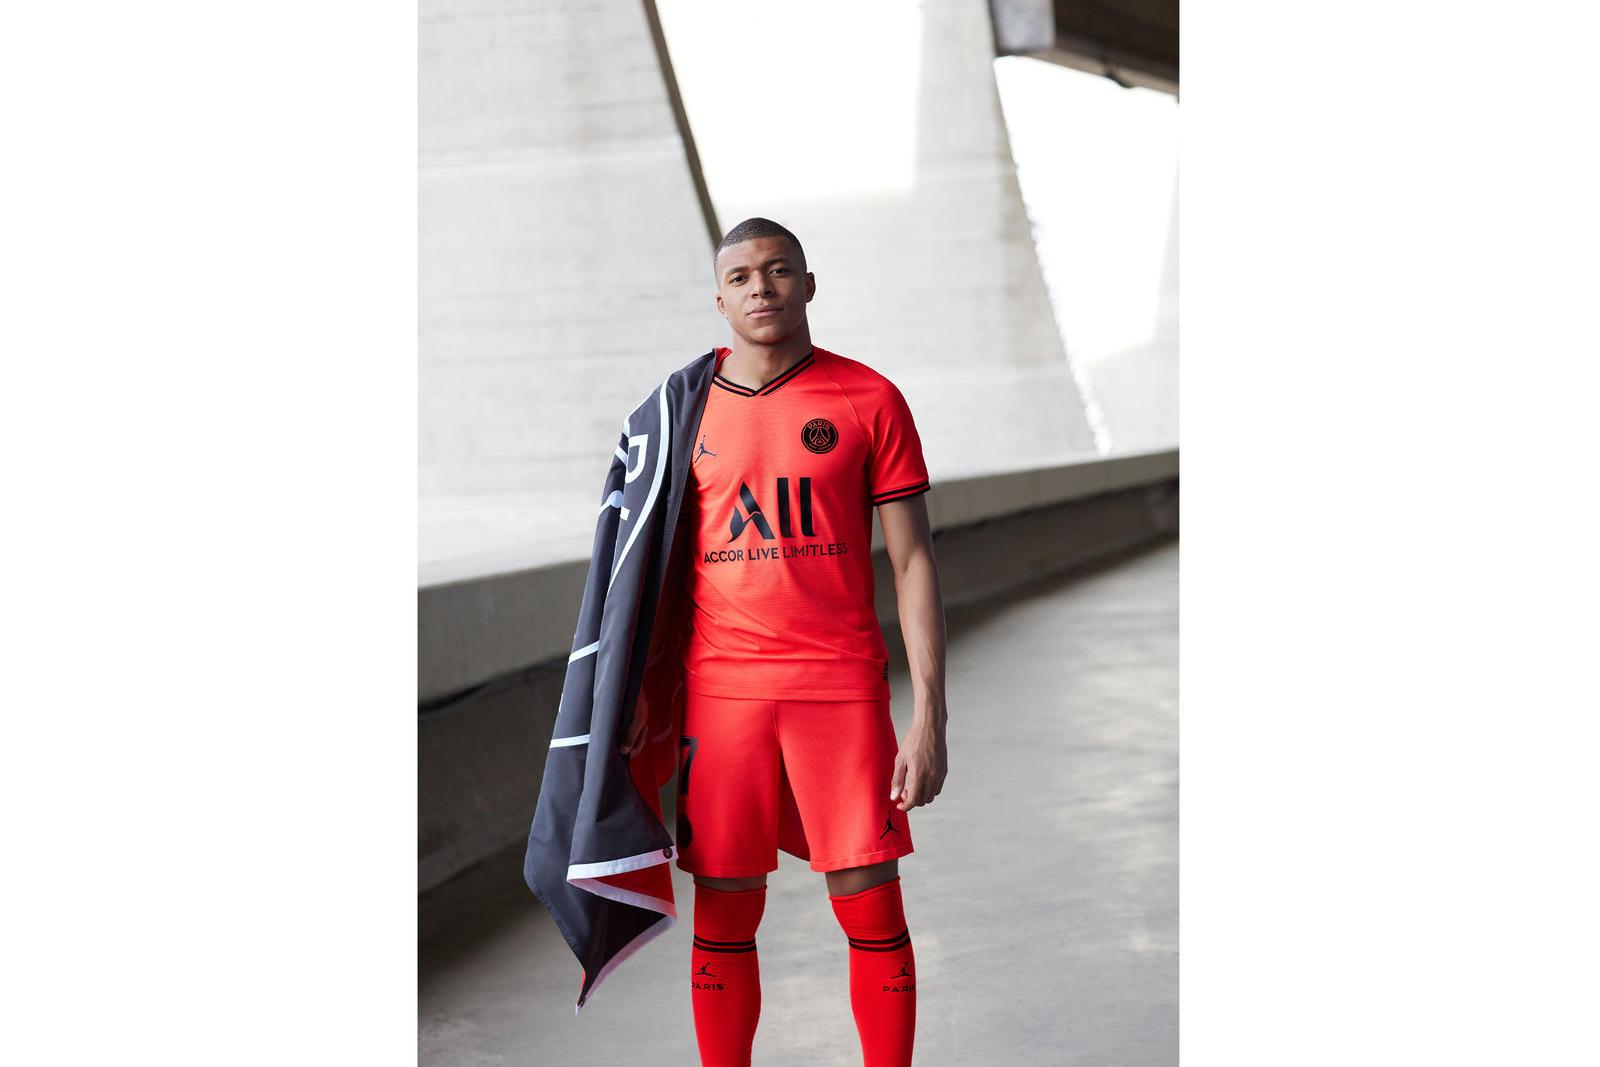 jordan-brand-paris-saint-germain-away-kit-2019-20-1_89275